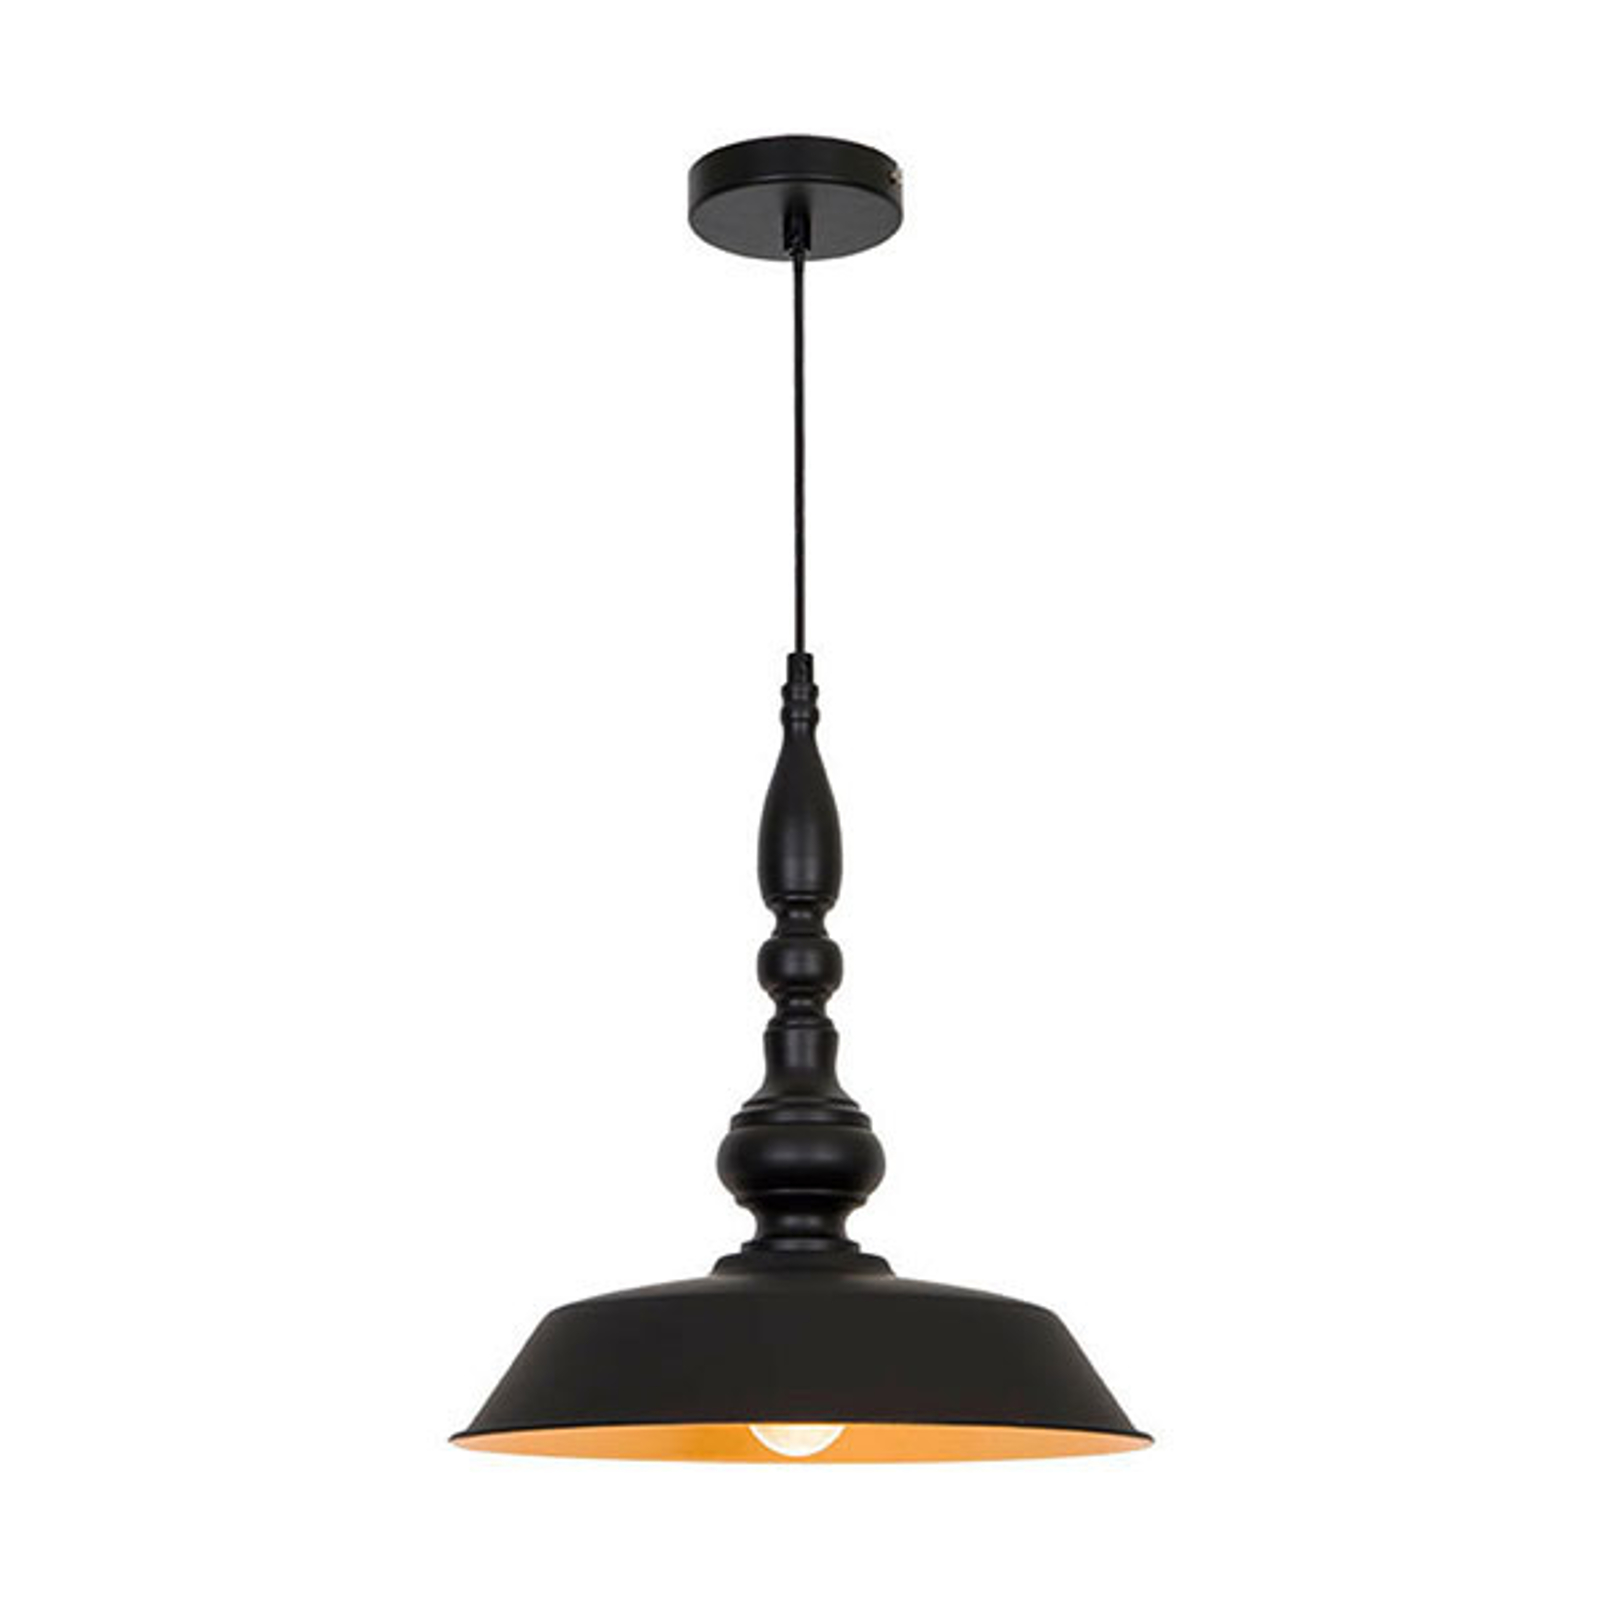 Lampa wisząca Colin, czarna, Ø 36 cm